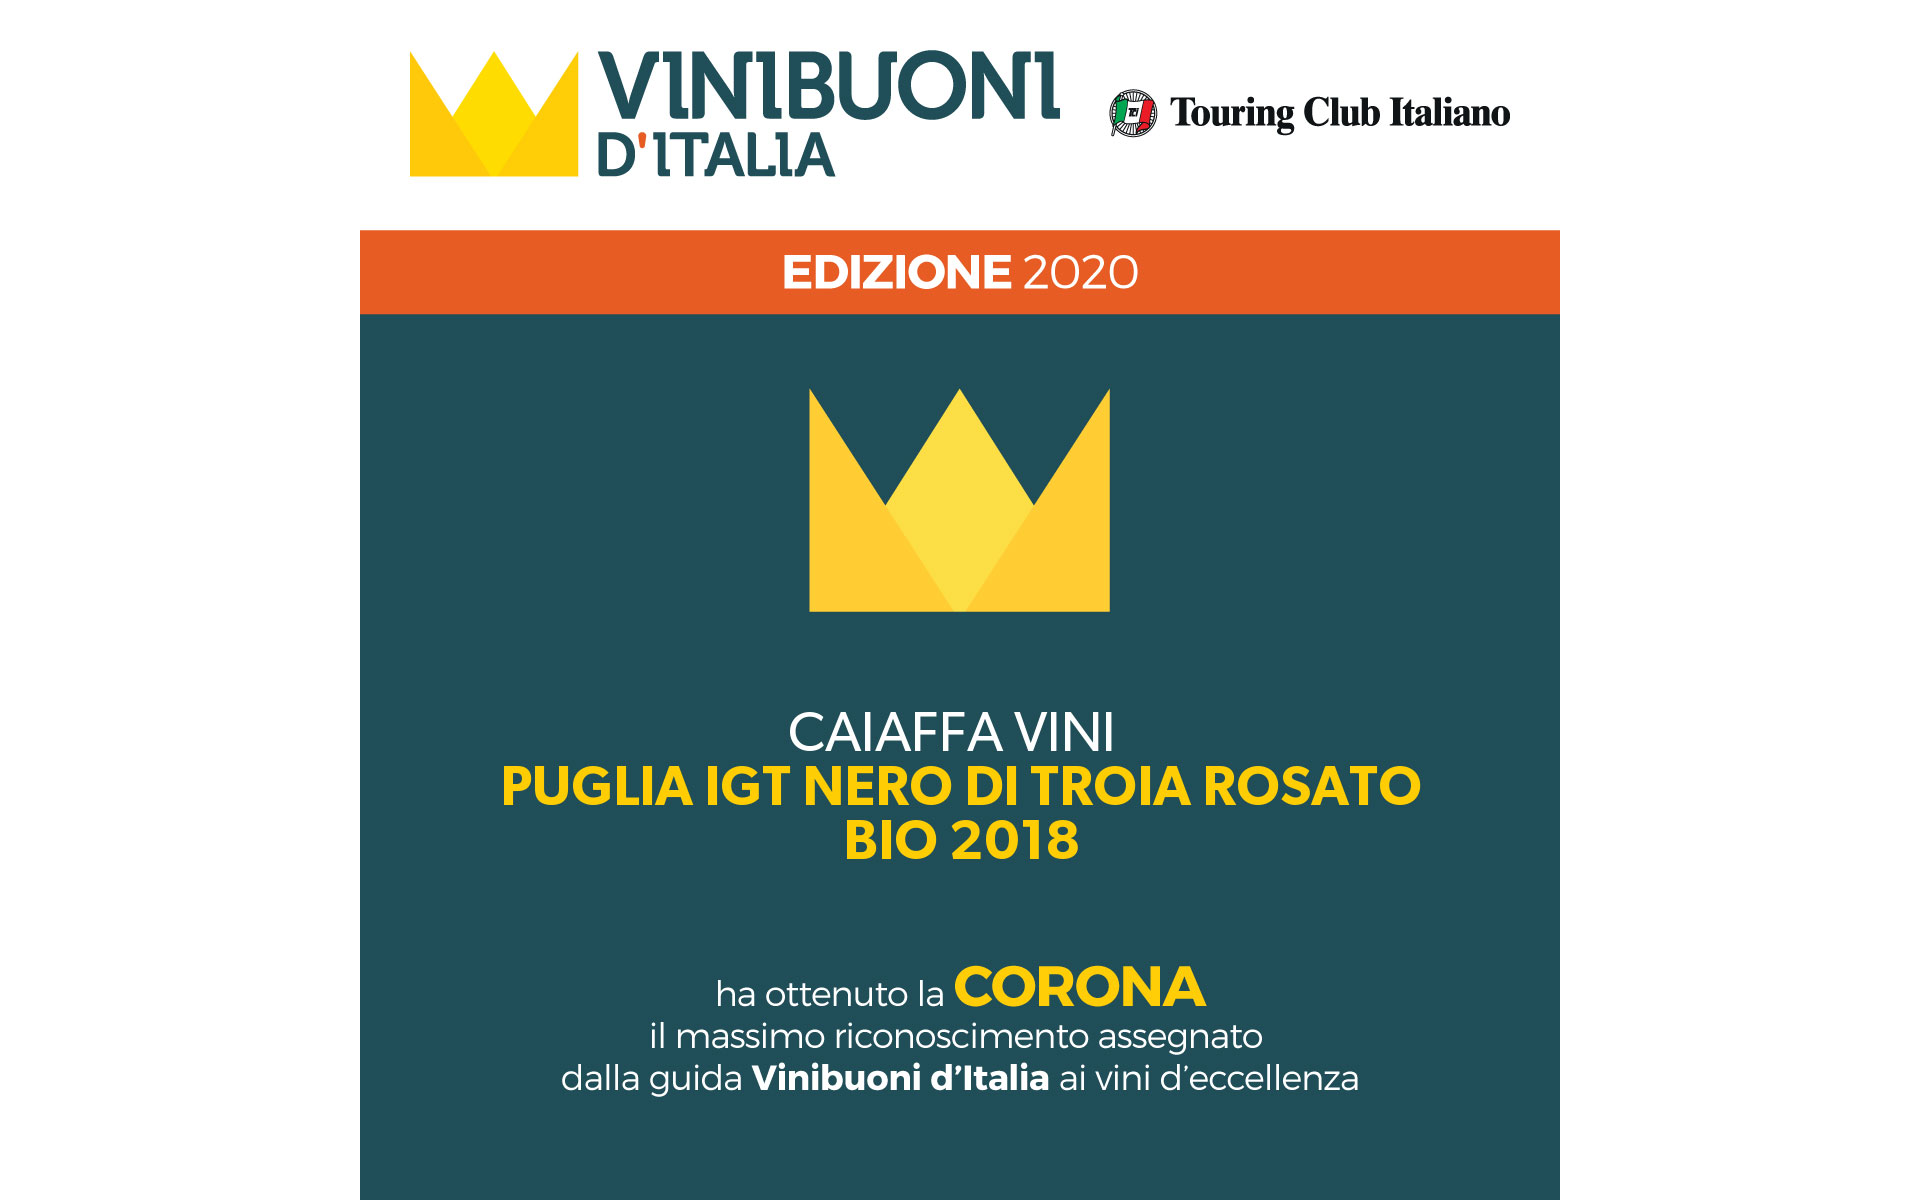 corona-vinibuoni-777